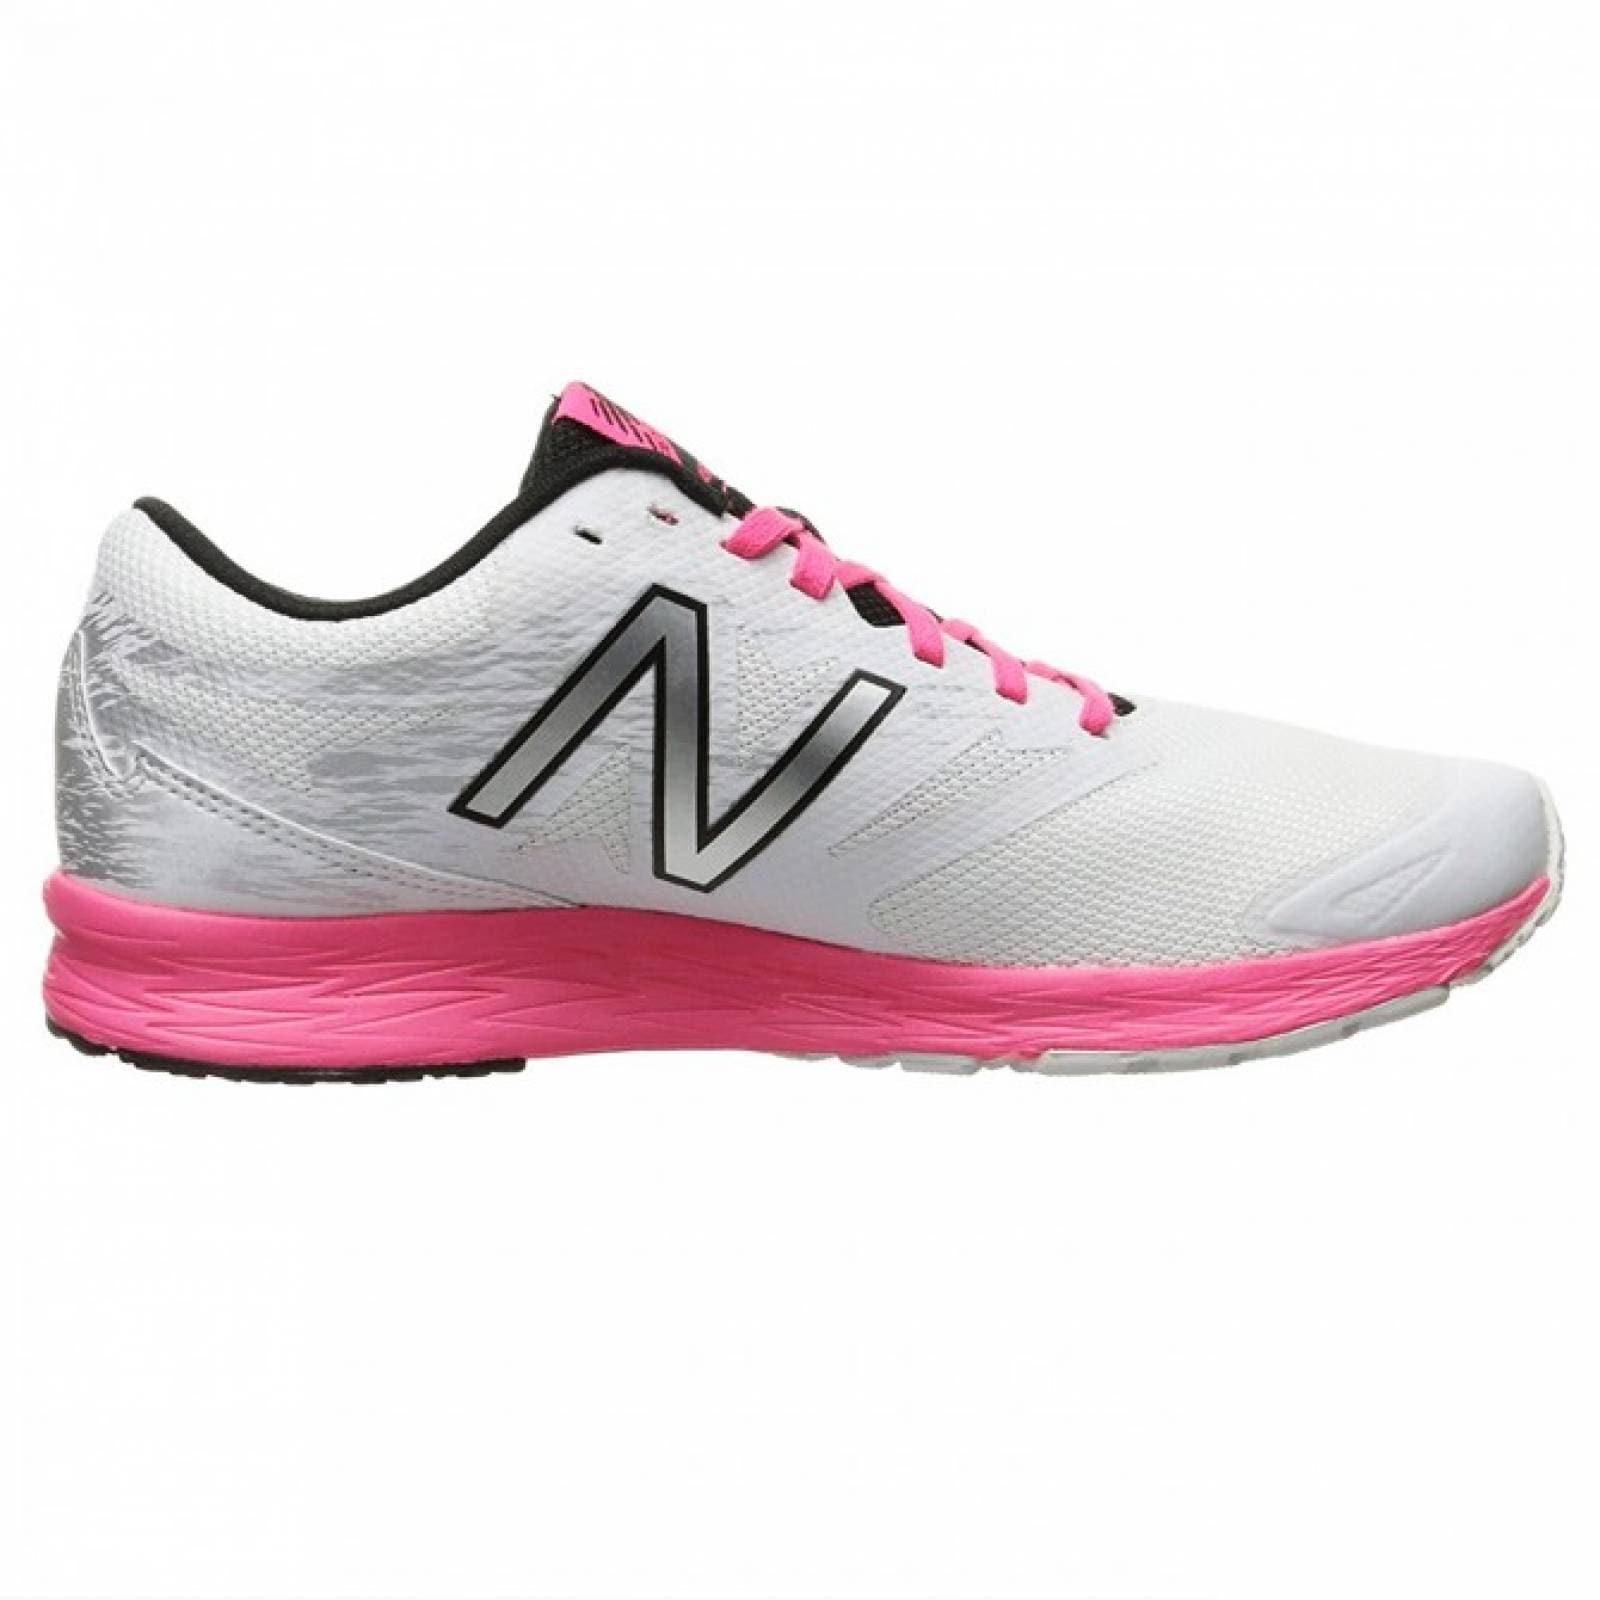 Tenis New Balance Running Course Dama Original WFLSHLW1